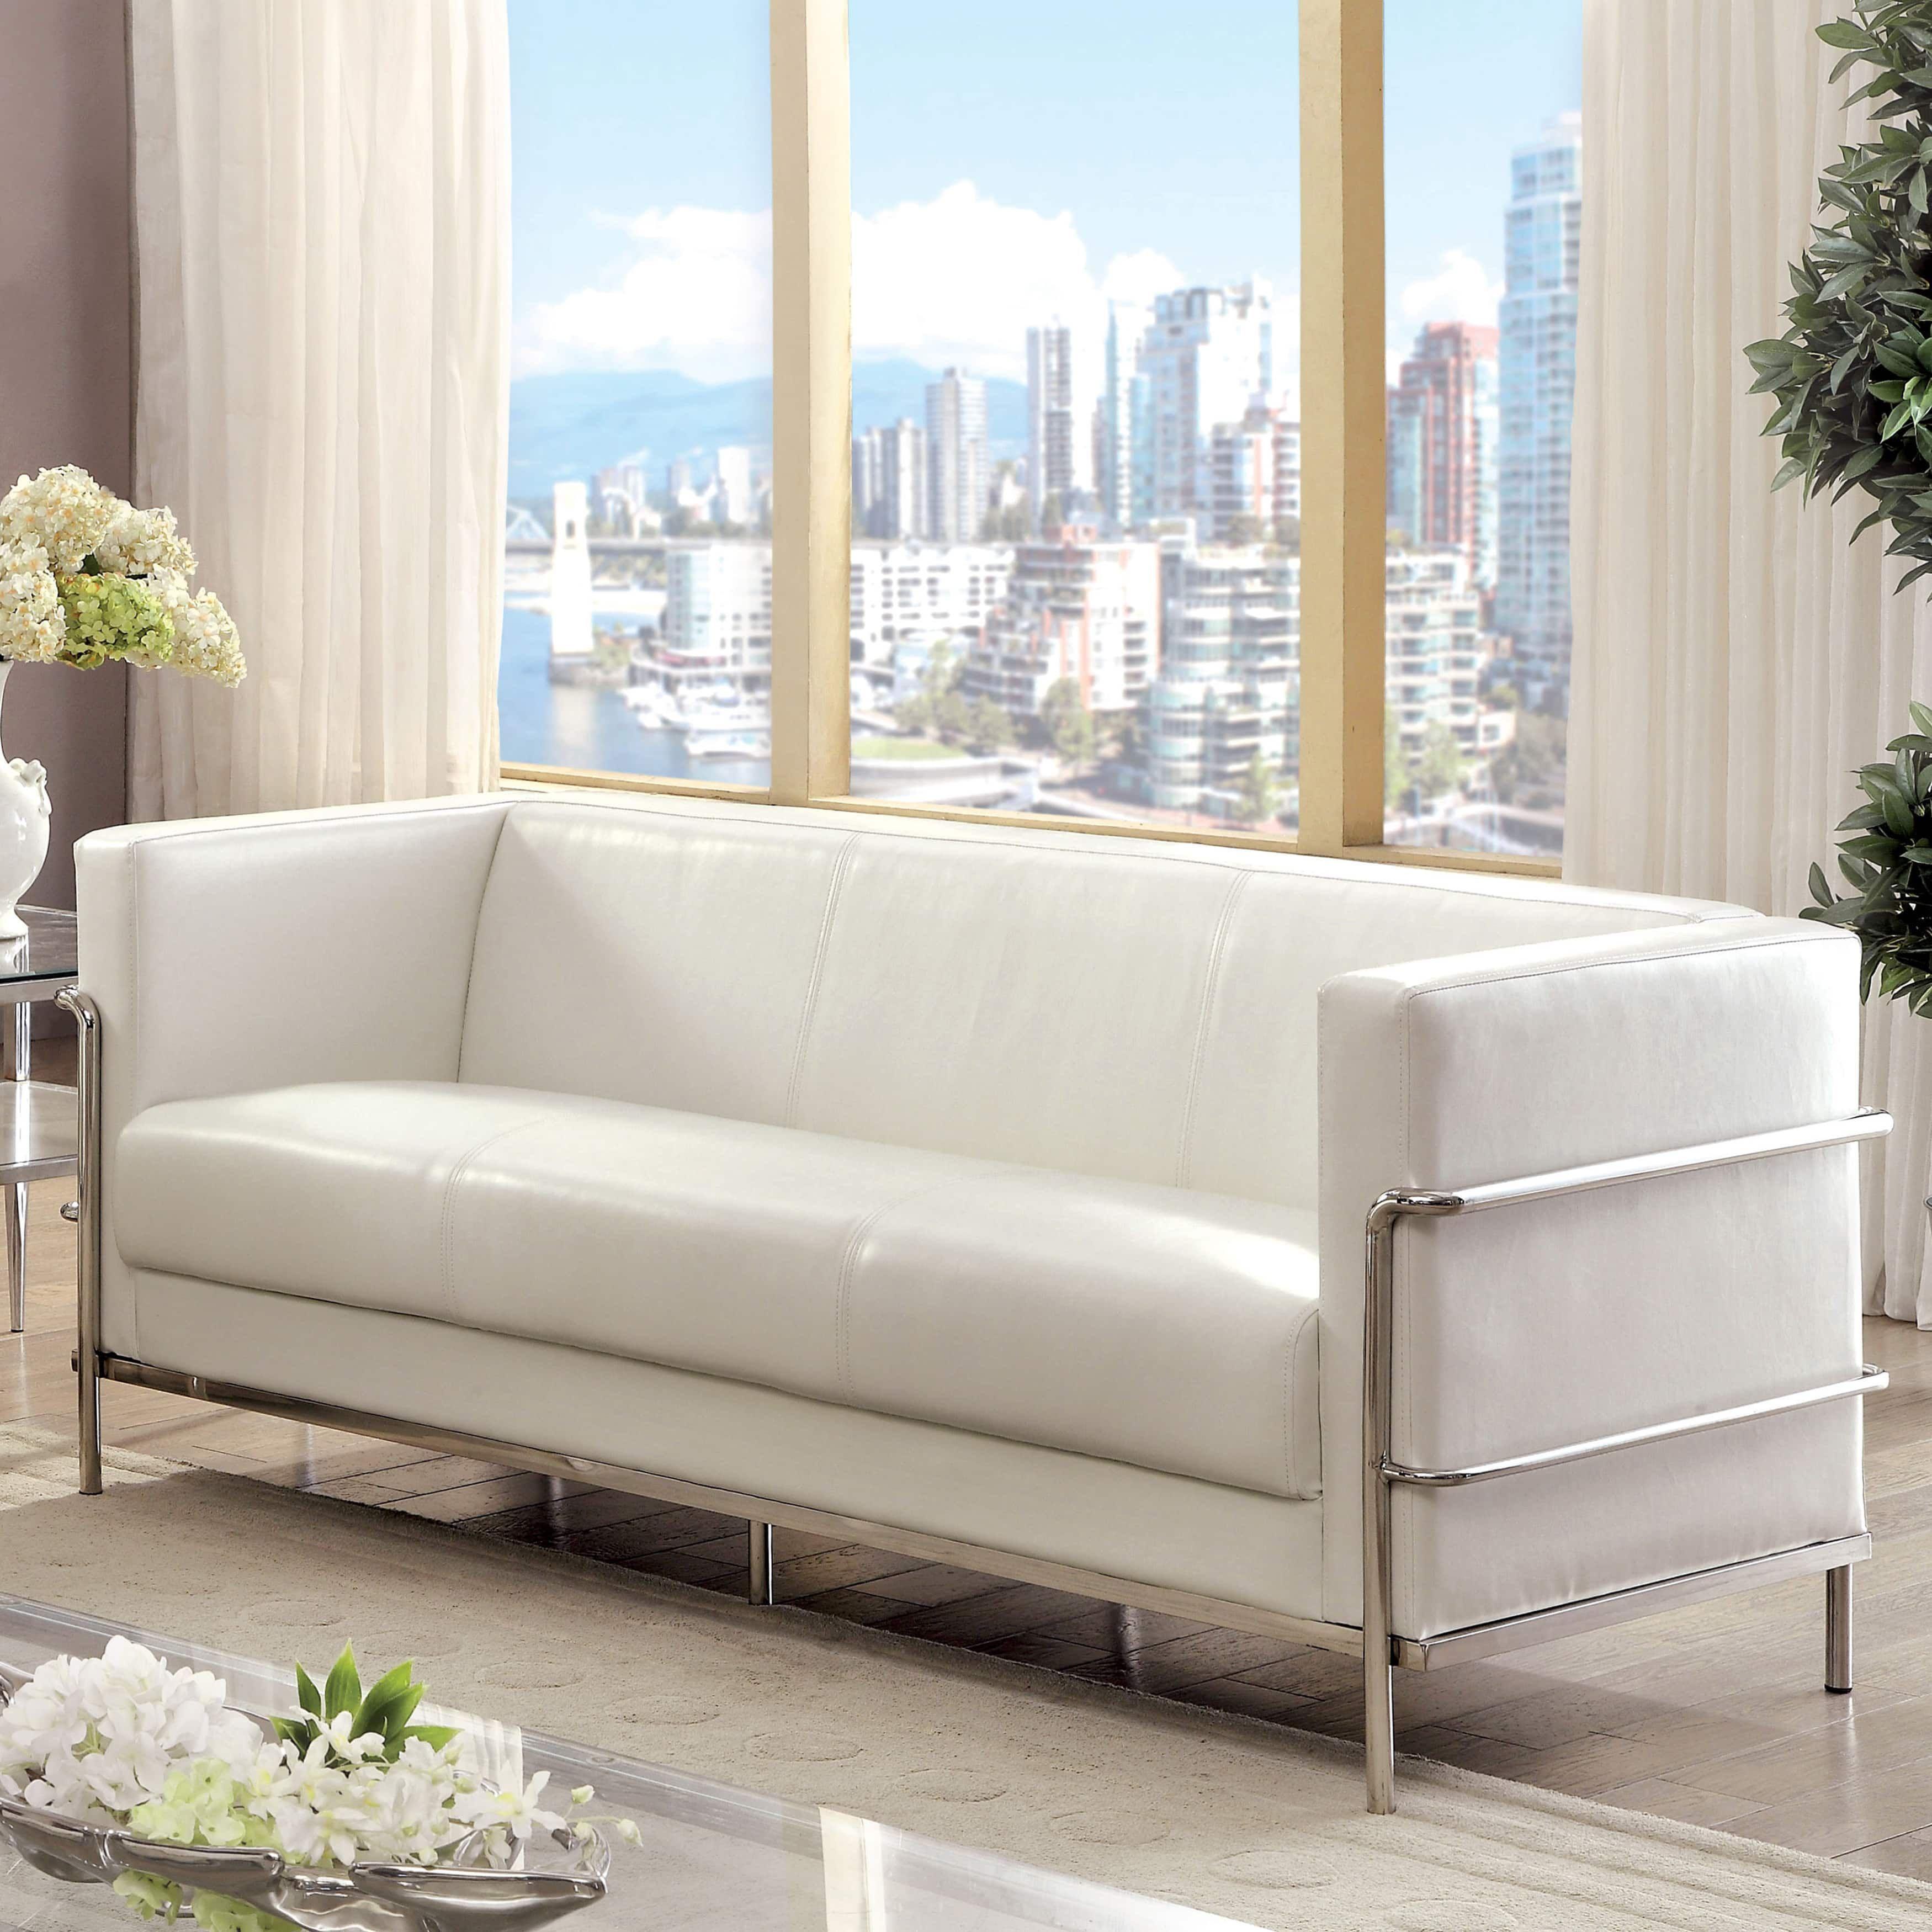 furniture of america sonica contemporary tuxedo style leather sofa rh pinterest co uk